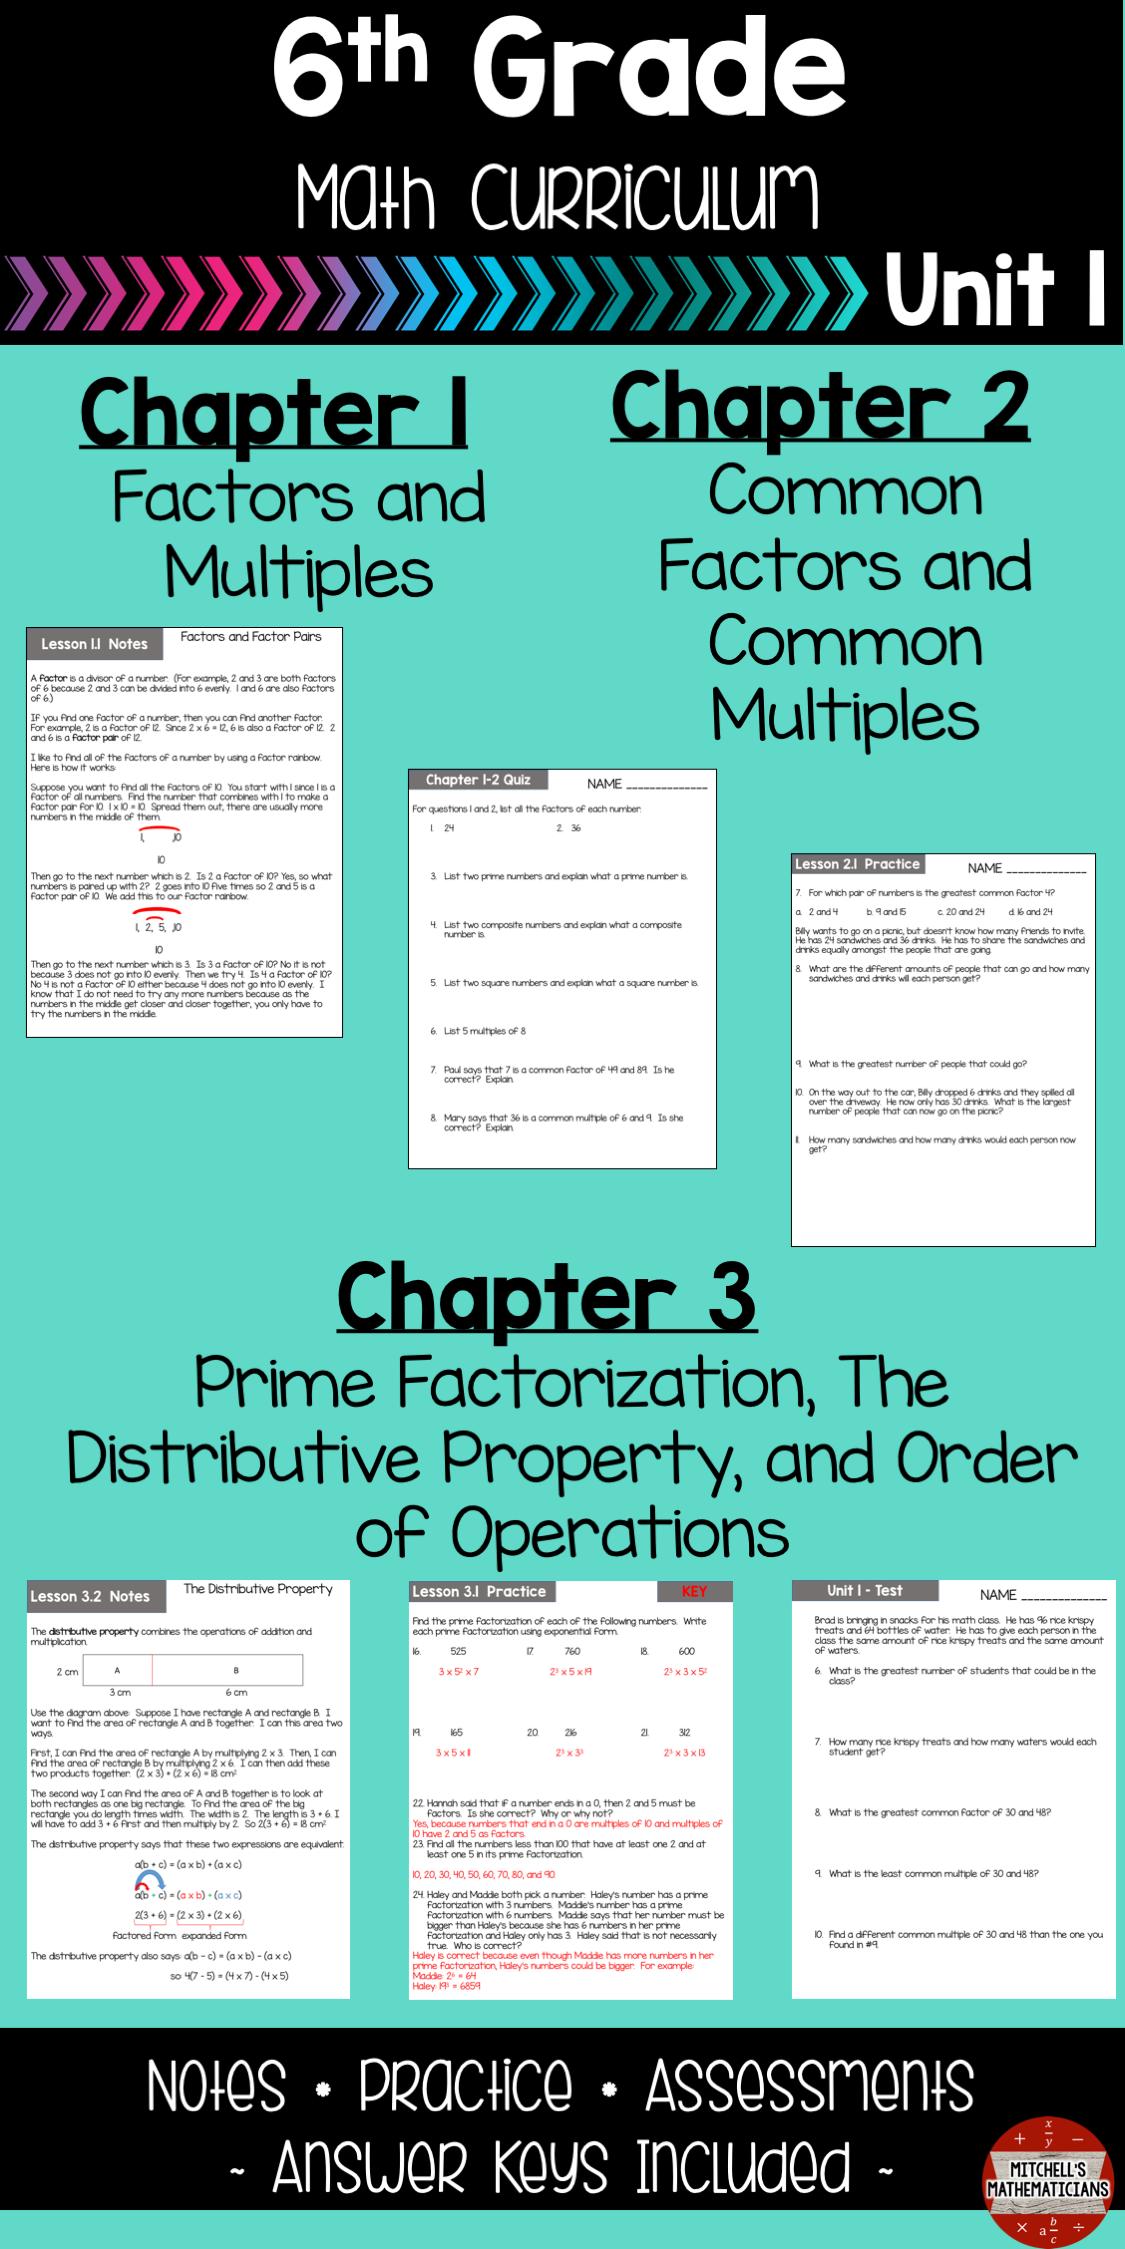 Distributive Property, GCF, LCM, and More 6th Grade Math Curriculum ...